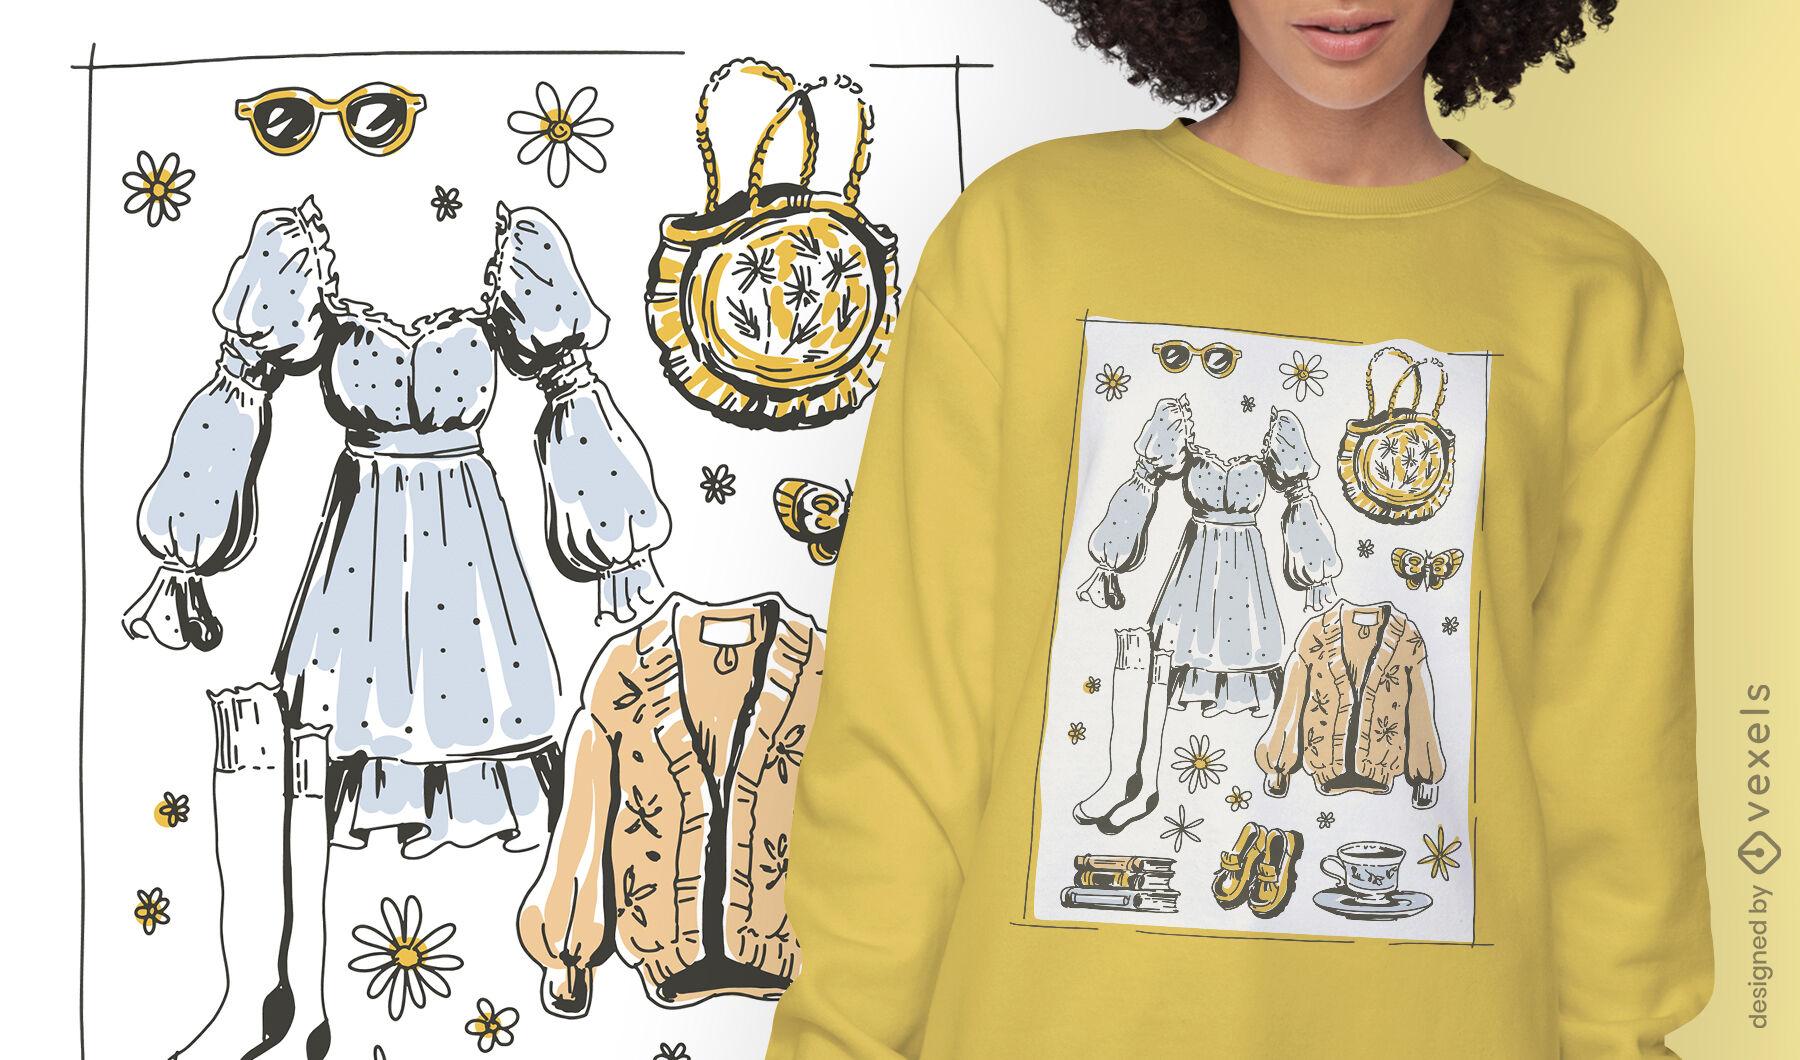 Diseño de camiseta de moda de estilo de vida de Cottagecore